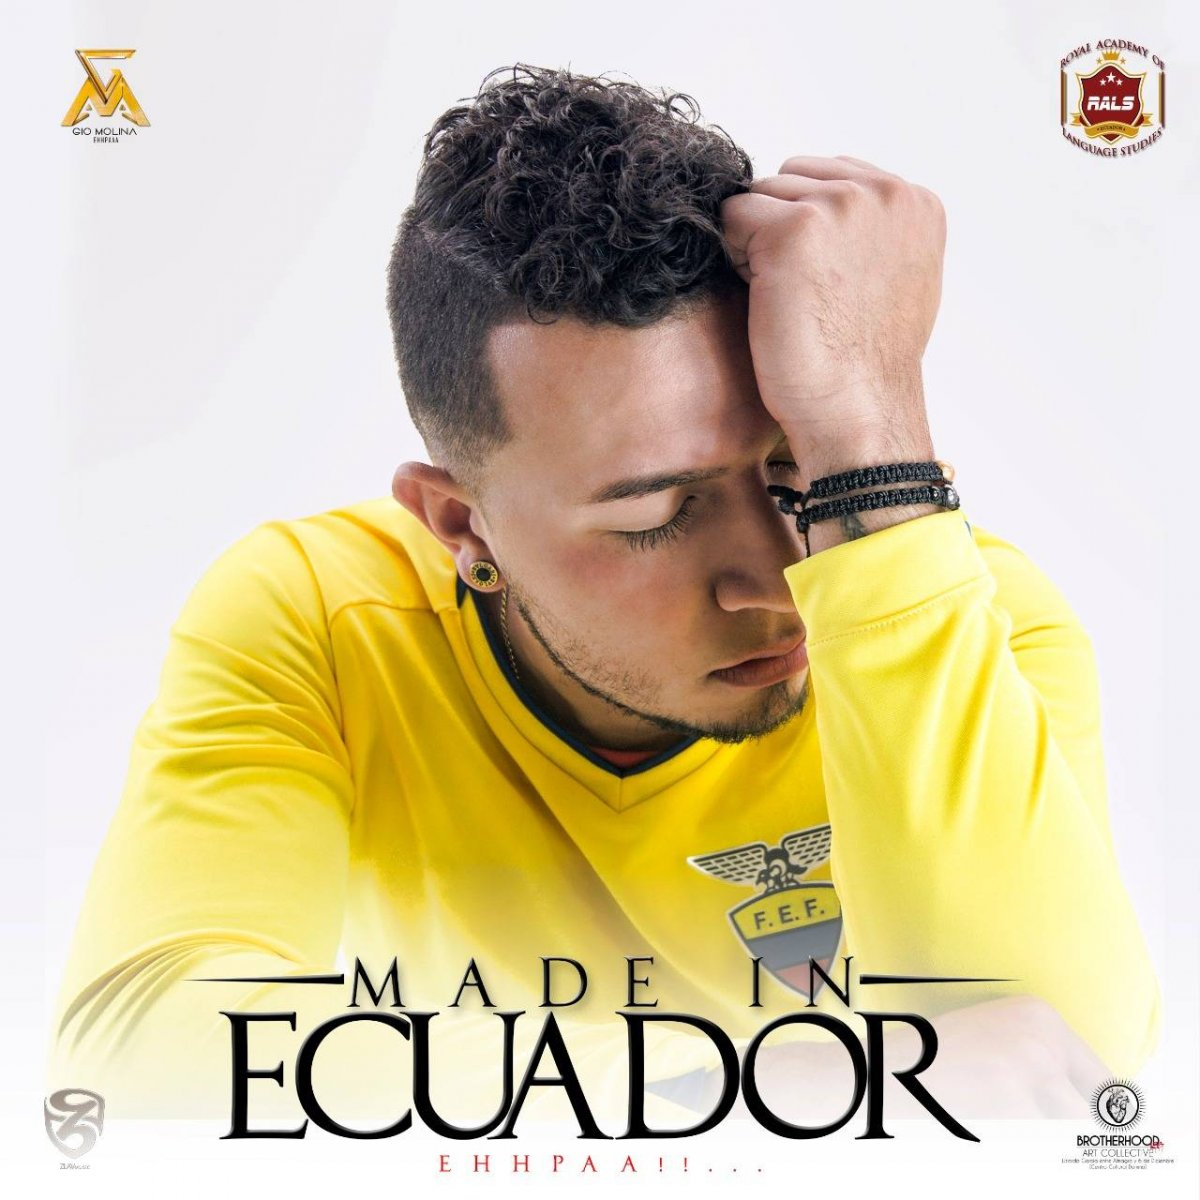 Gio Molina 'Gio' Molina presenta su nuevo tema Made in Ecuador